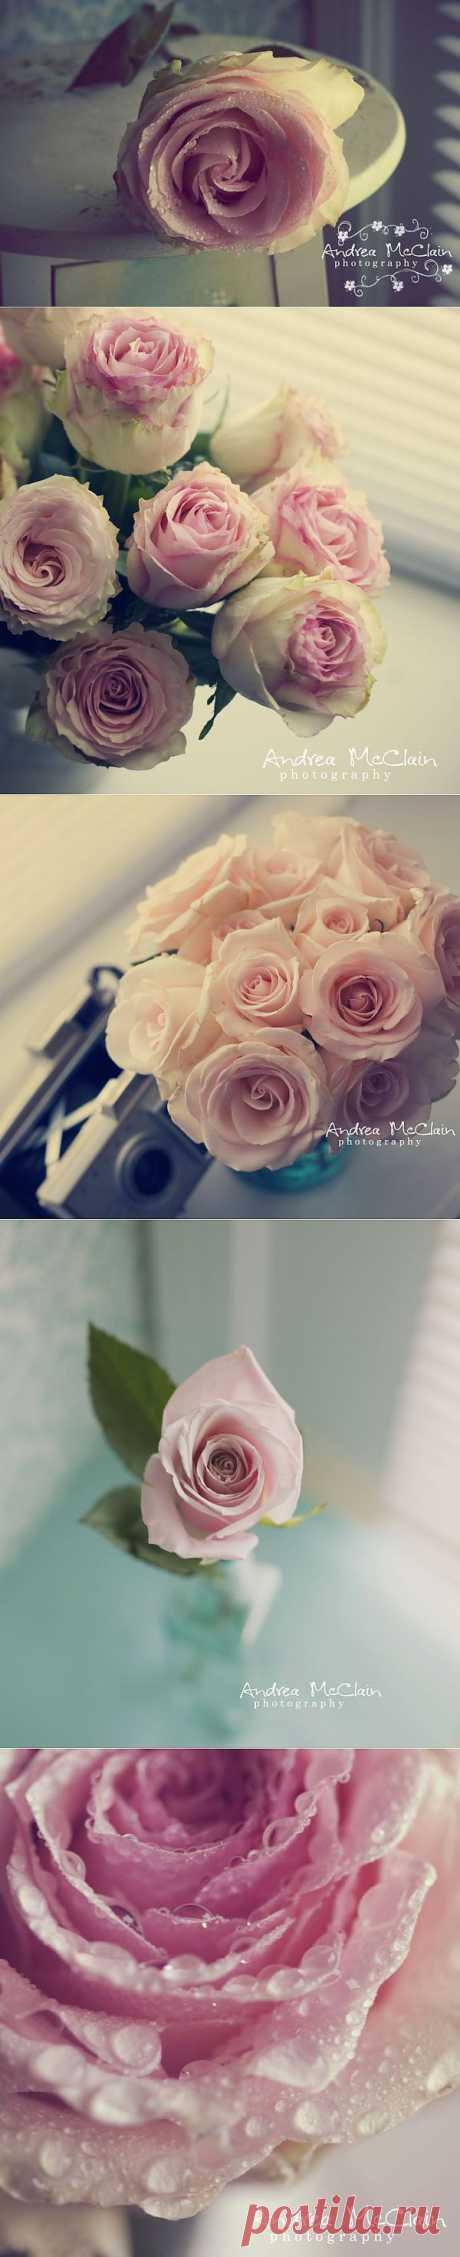 Цветы от Андреа Макклейн.